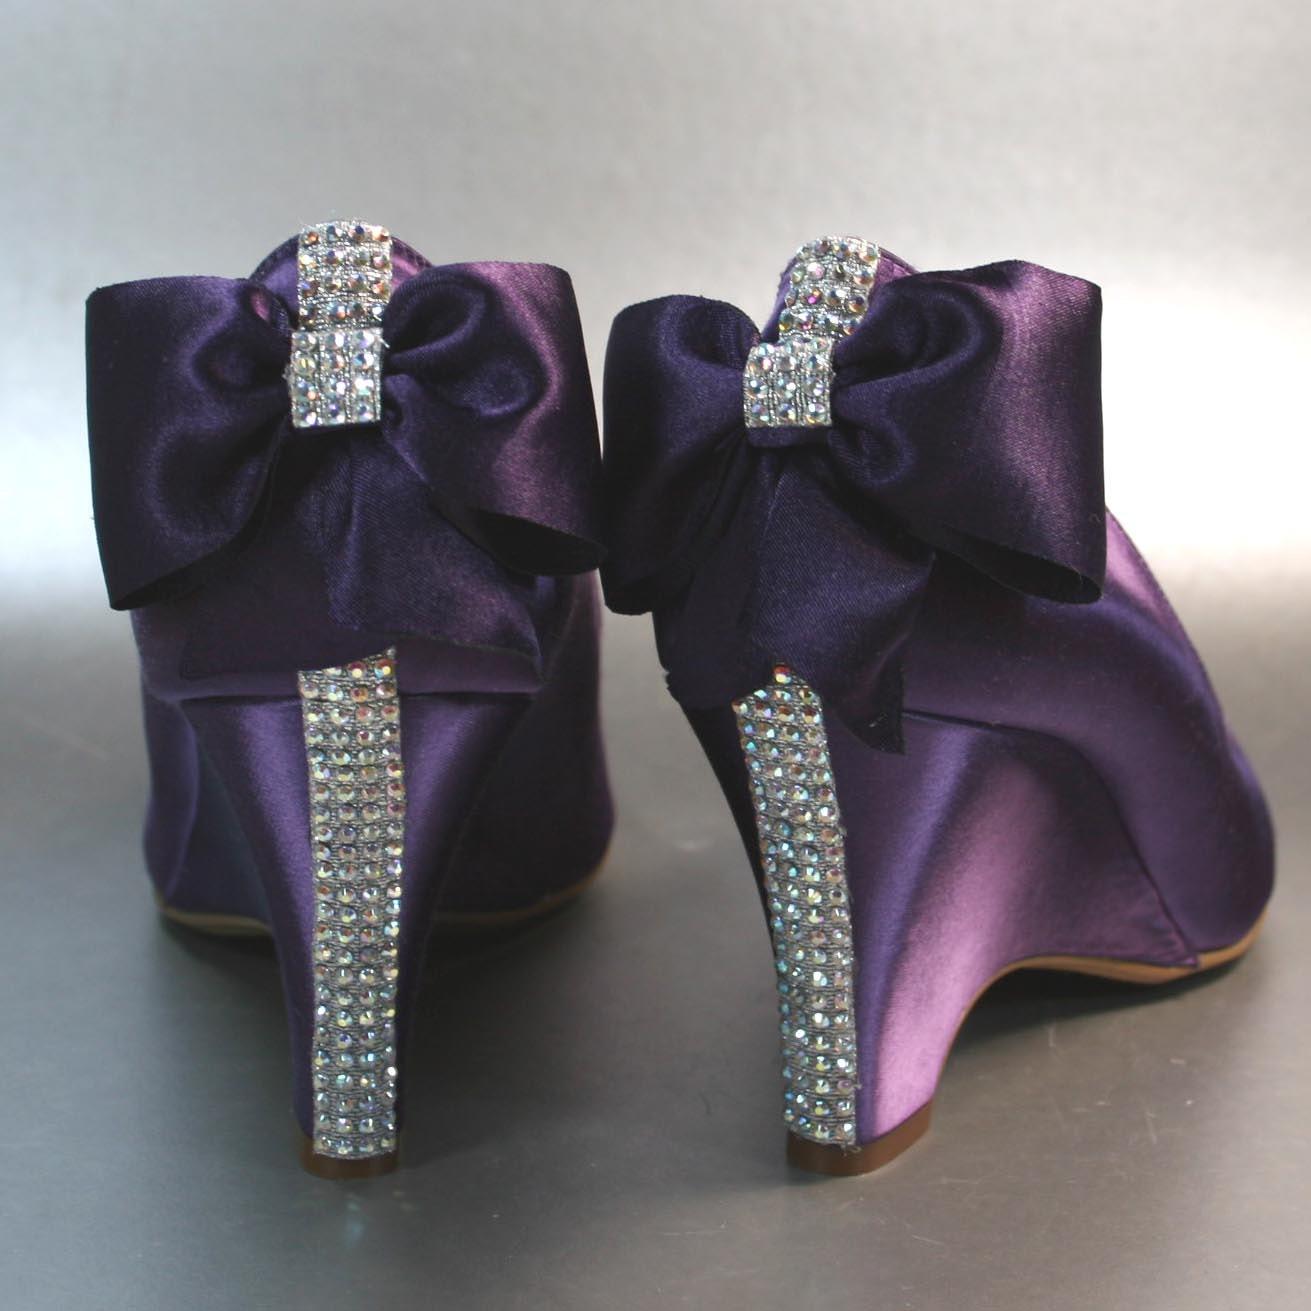 sle sale wedding shoes purple wedges with rhinestones